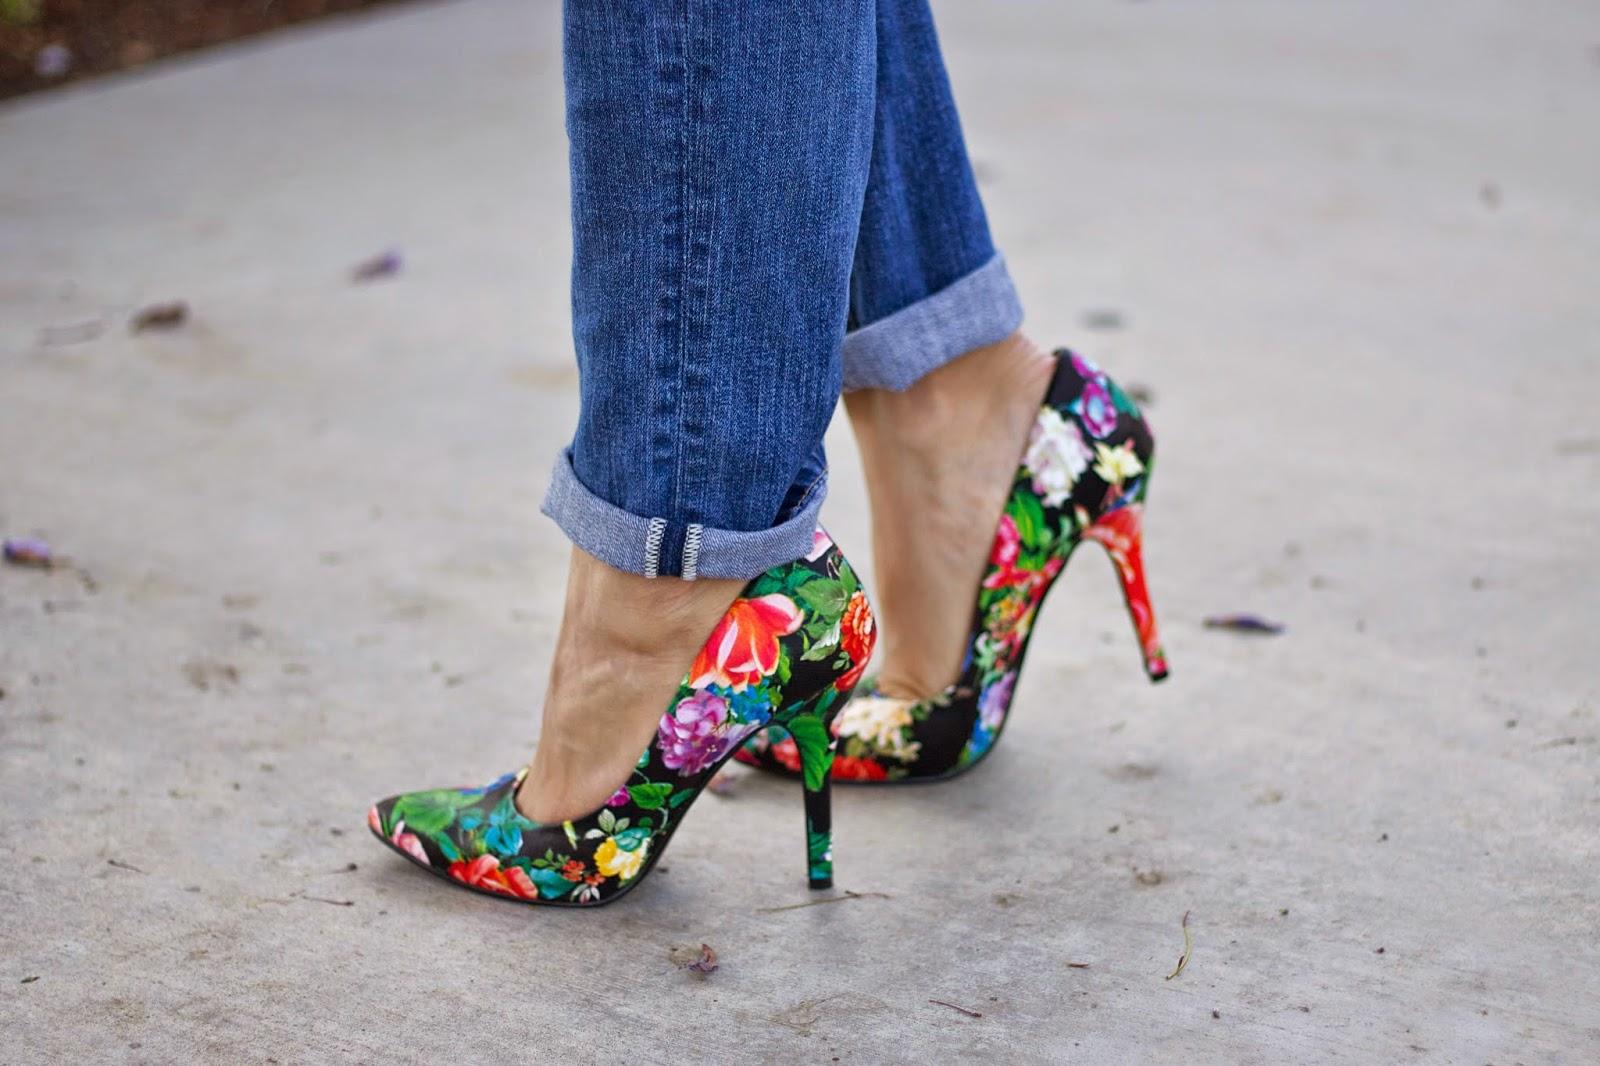 Charlotte Russe floral heels, qupid floral heels, red floral heels, black floral pumps, Spring 2015 heels, Summer 2015 heels